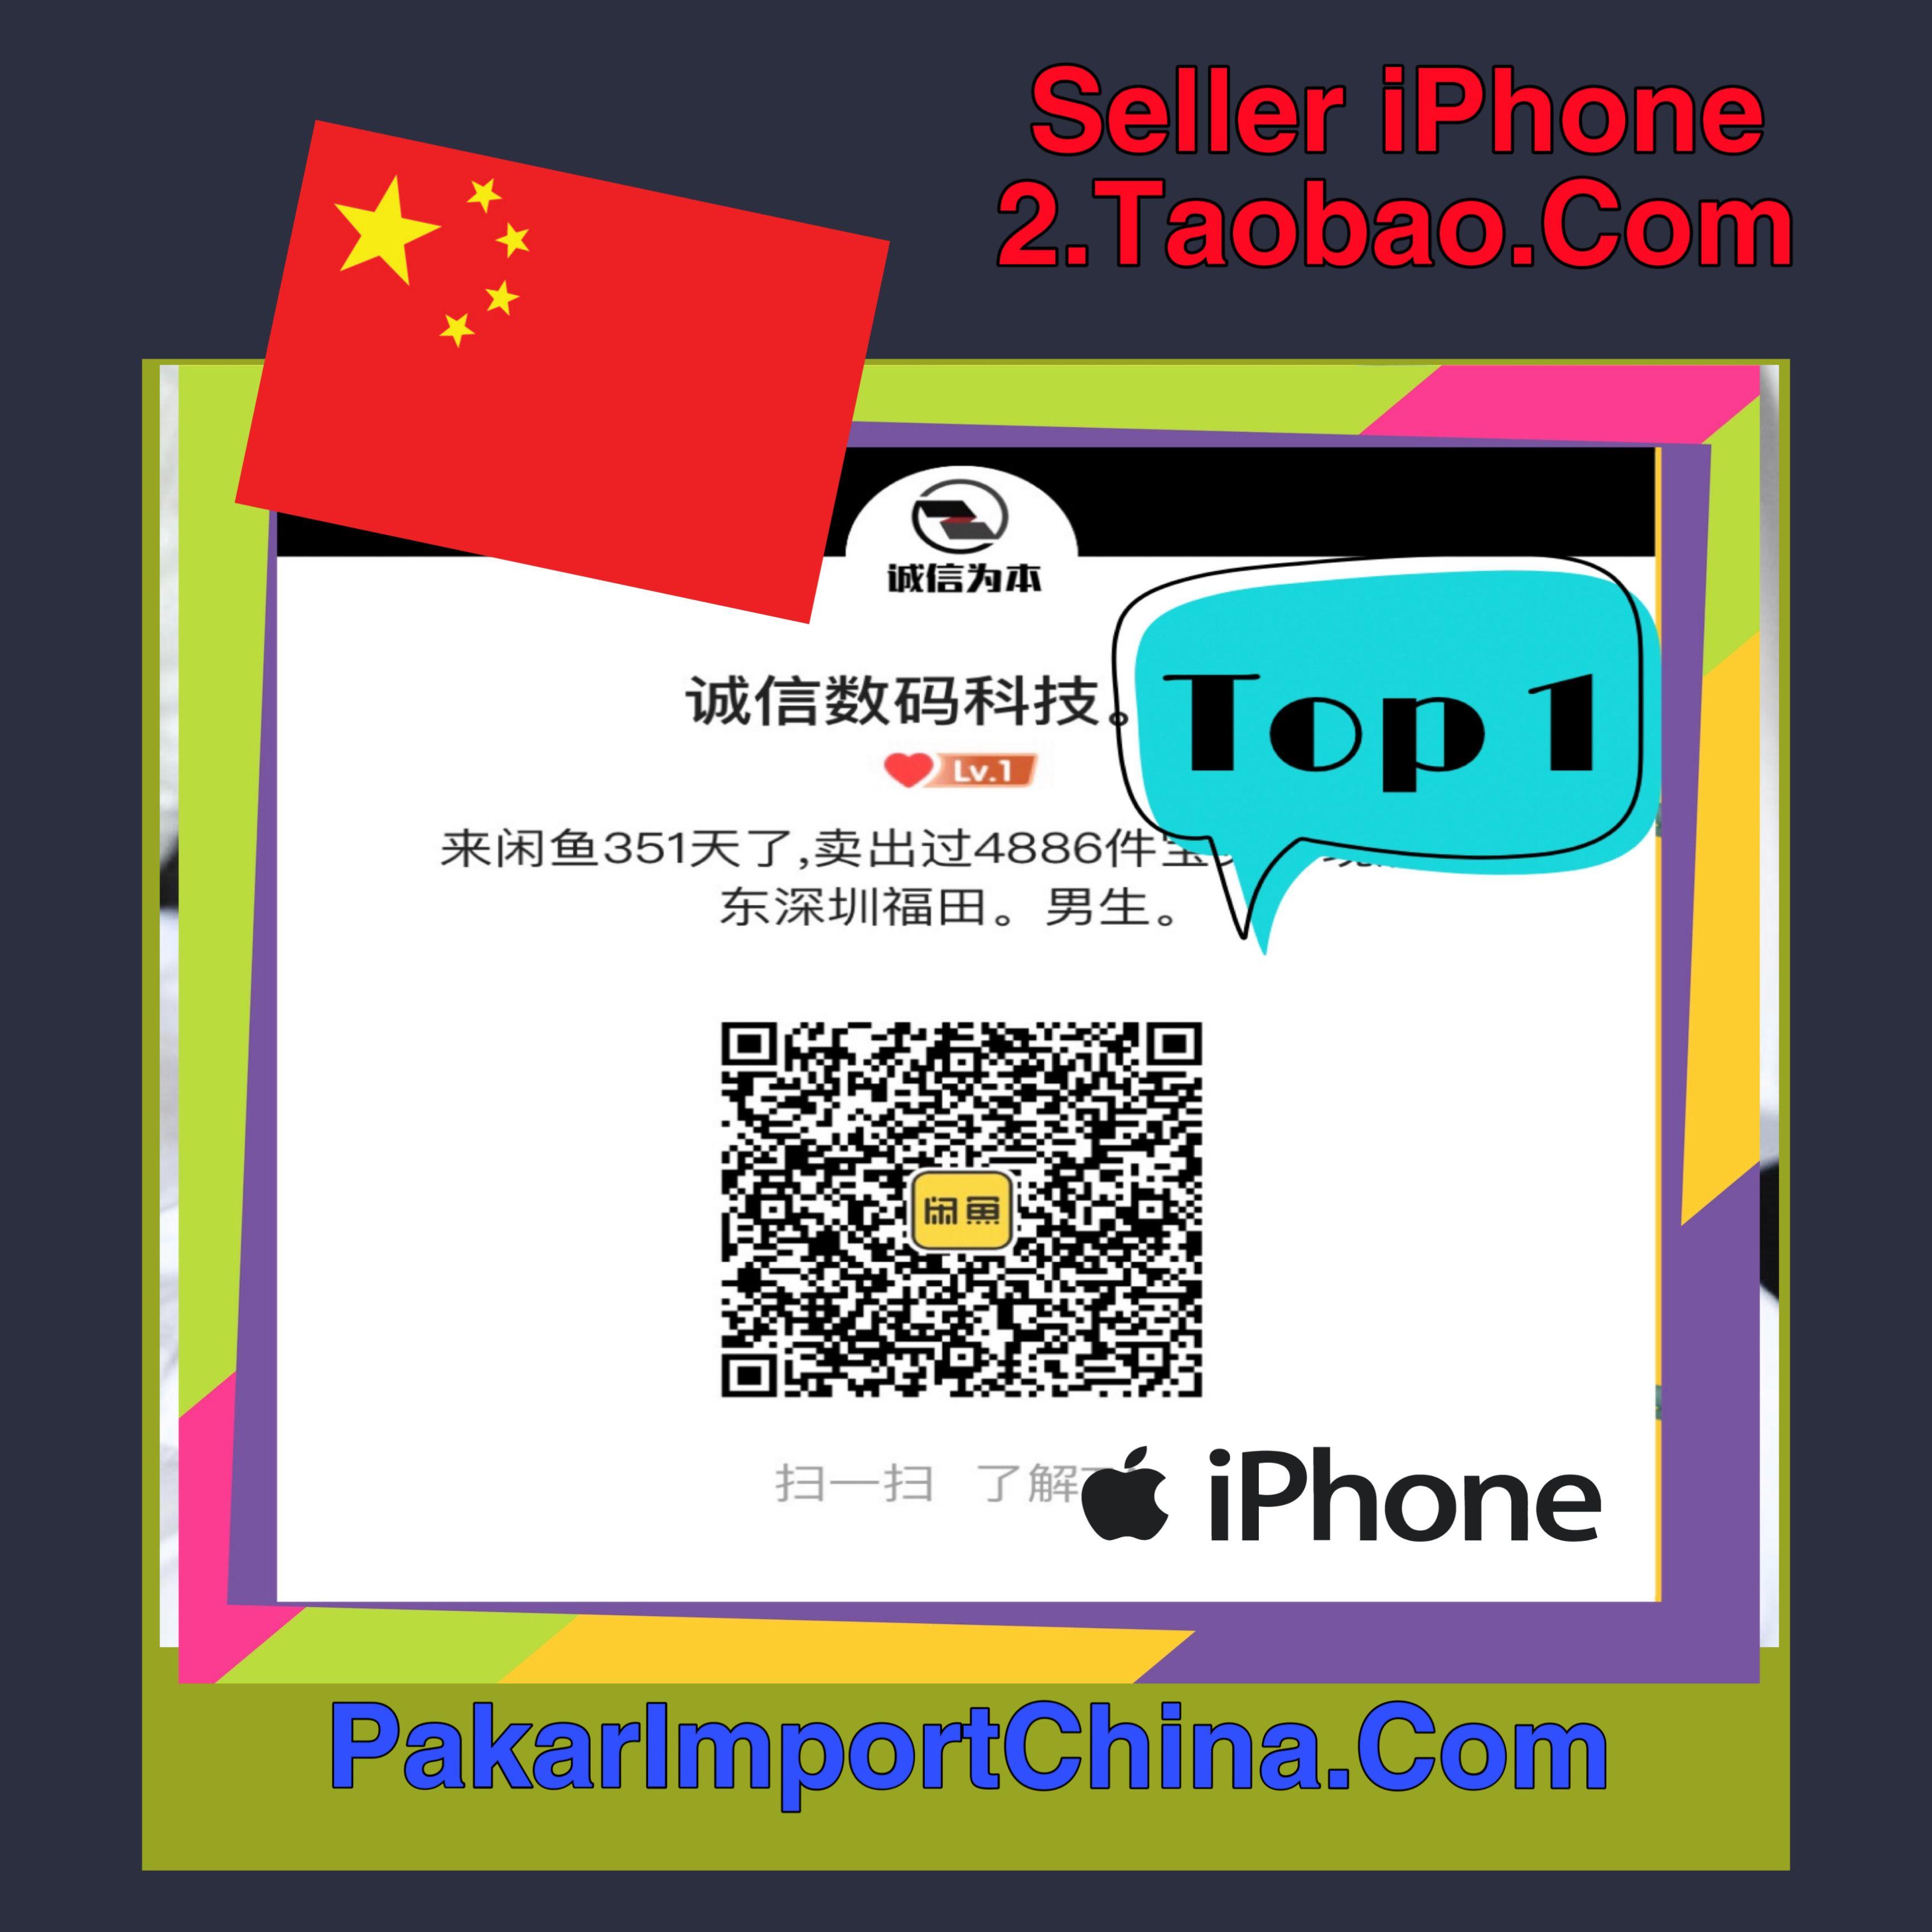 Iphone Supplier List Belajar